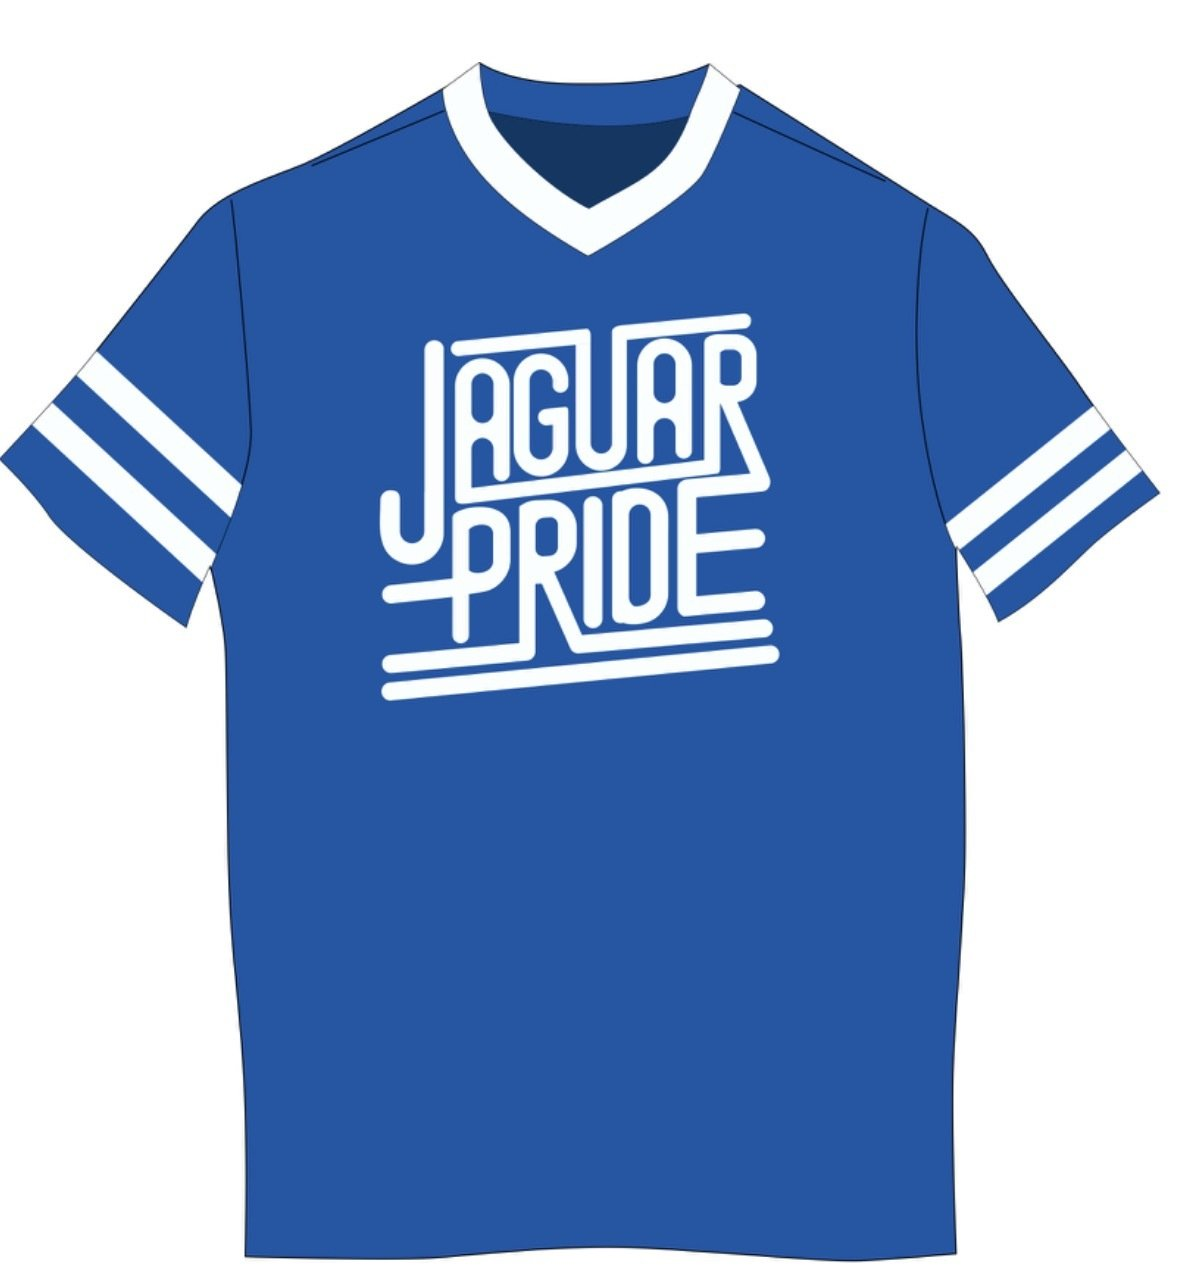 AUGUSTA Sleeve Stripe Jersey -- JAGUAR PRIDE - WHITE IMPRINT